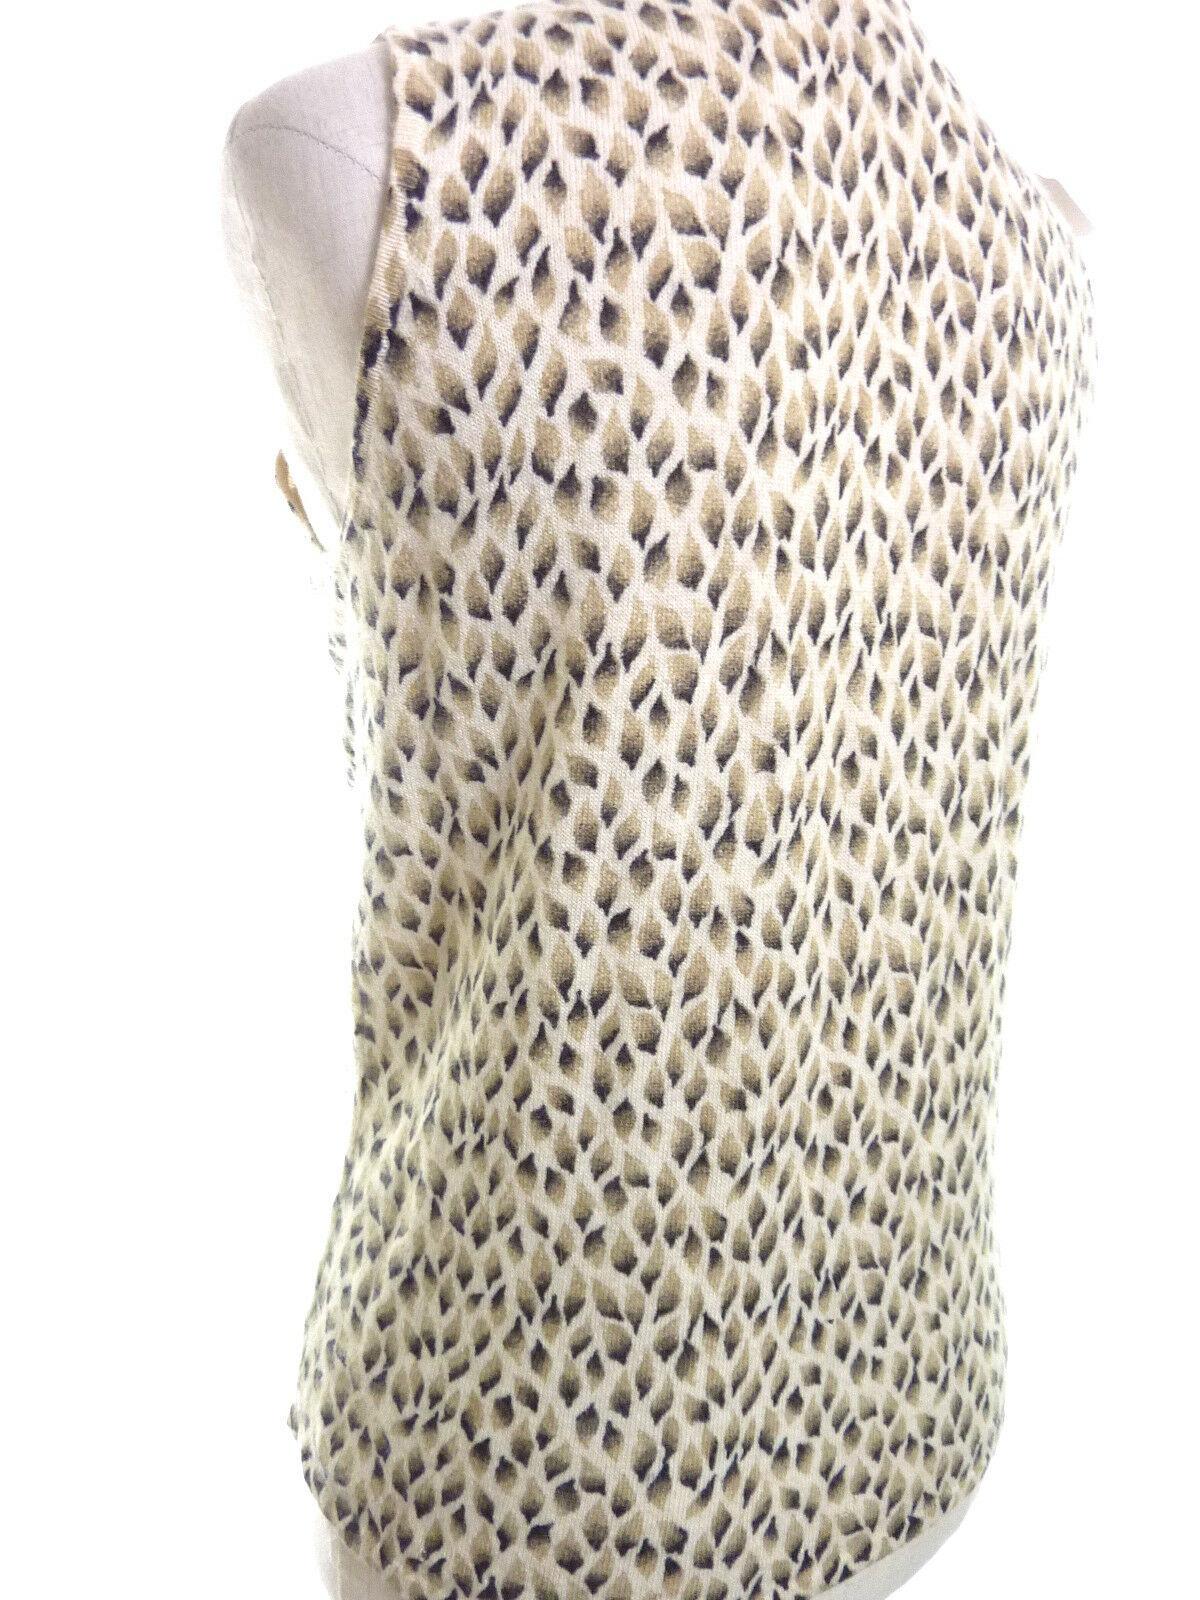 Ann Taylor Wool Sweater Vest Medium Animal Print Brown Beige Angora Blend image 3